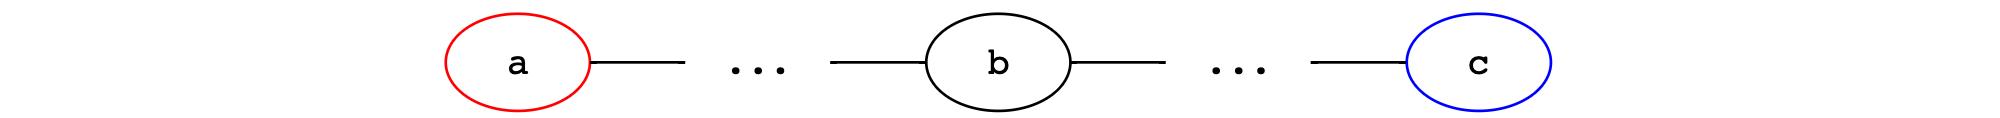 Flat commit graph